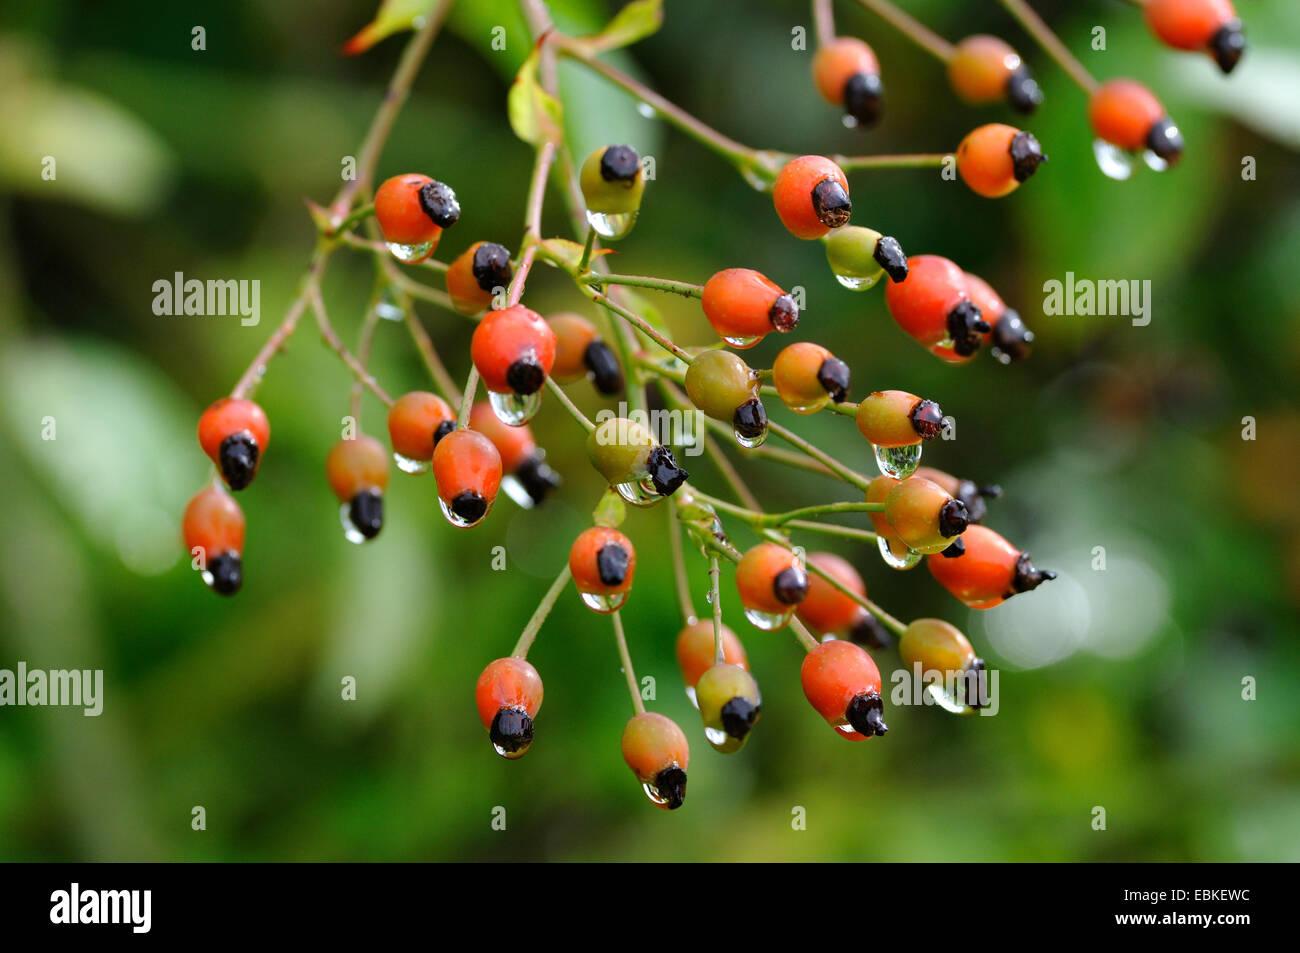 Japanese rose, multiflora rose, rambler rose (Rosa multiflora), fruits with rain drops - Stock Image